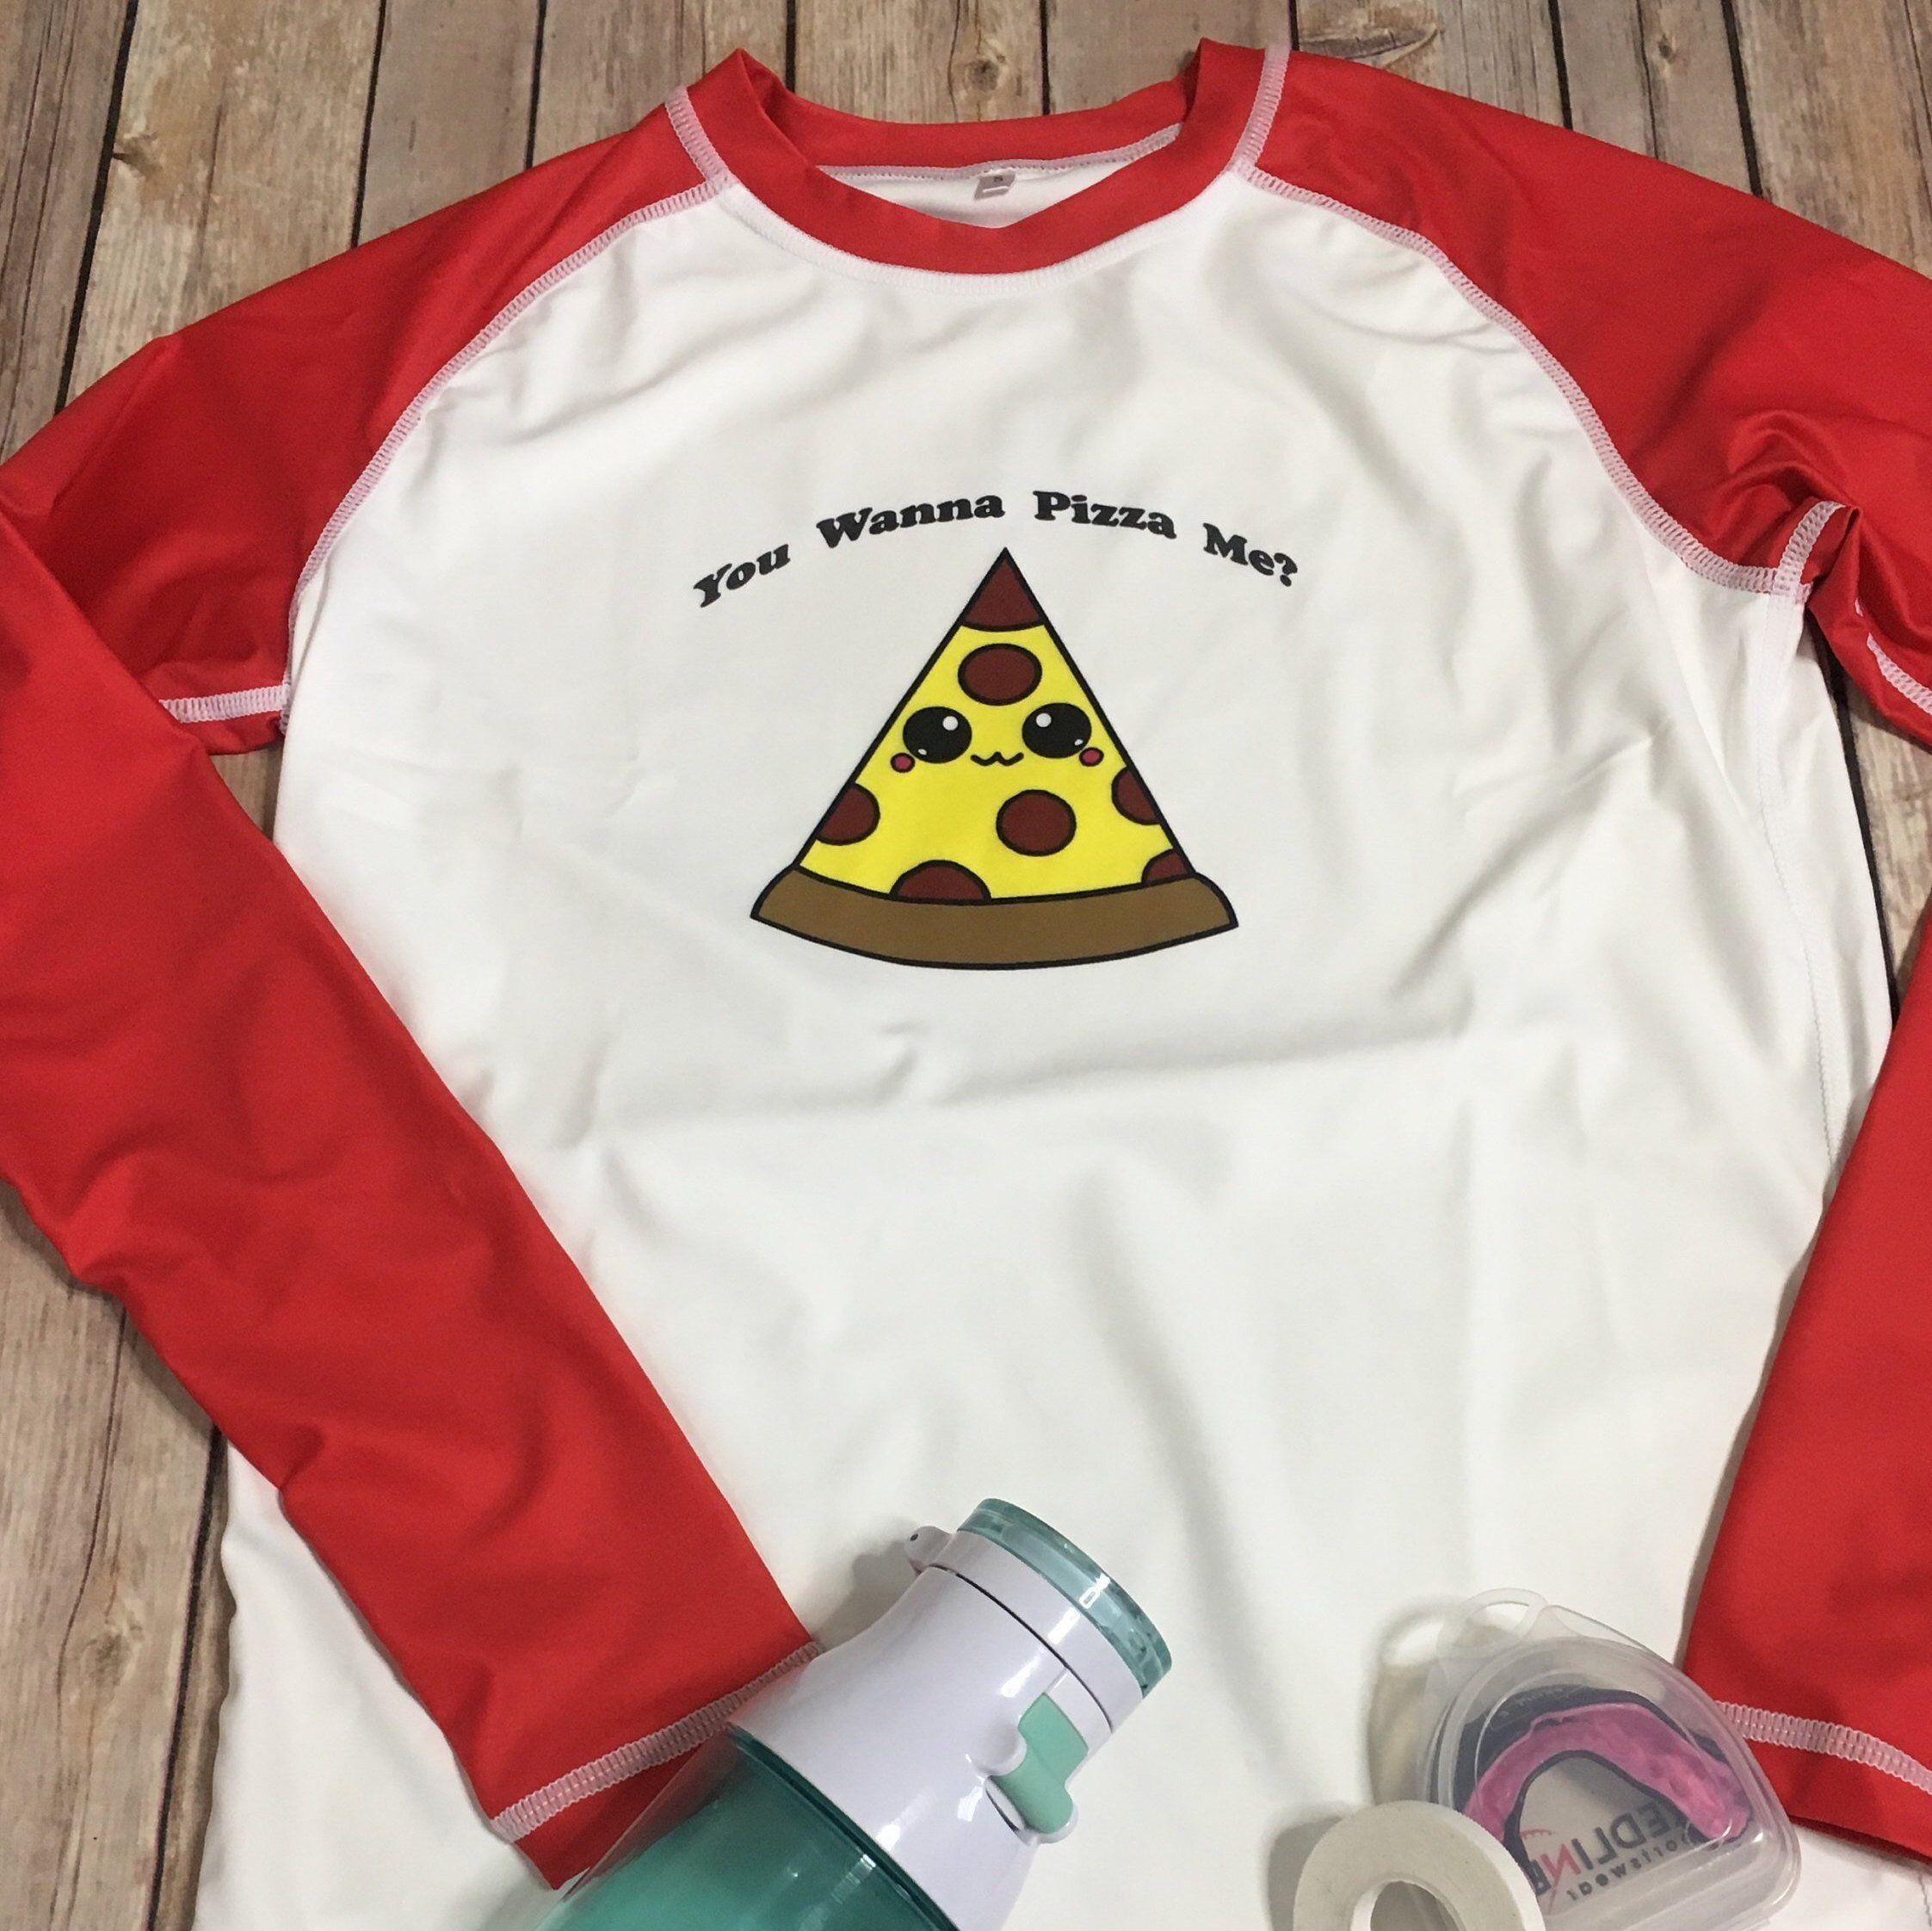 Brazilian Jiu Jitsu Pizza Rashguard